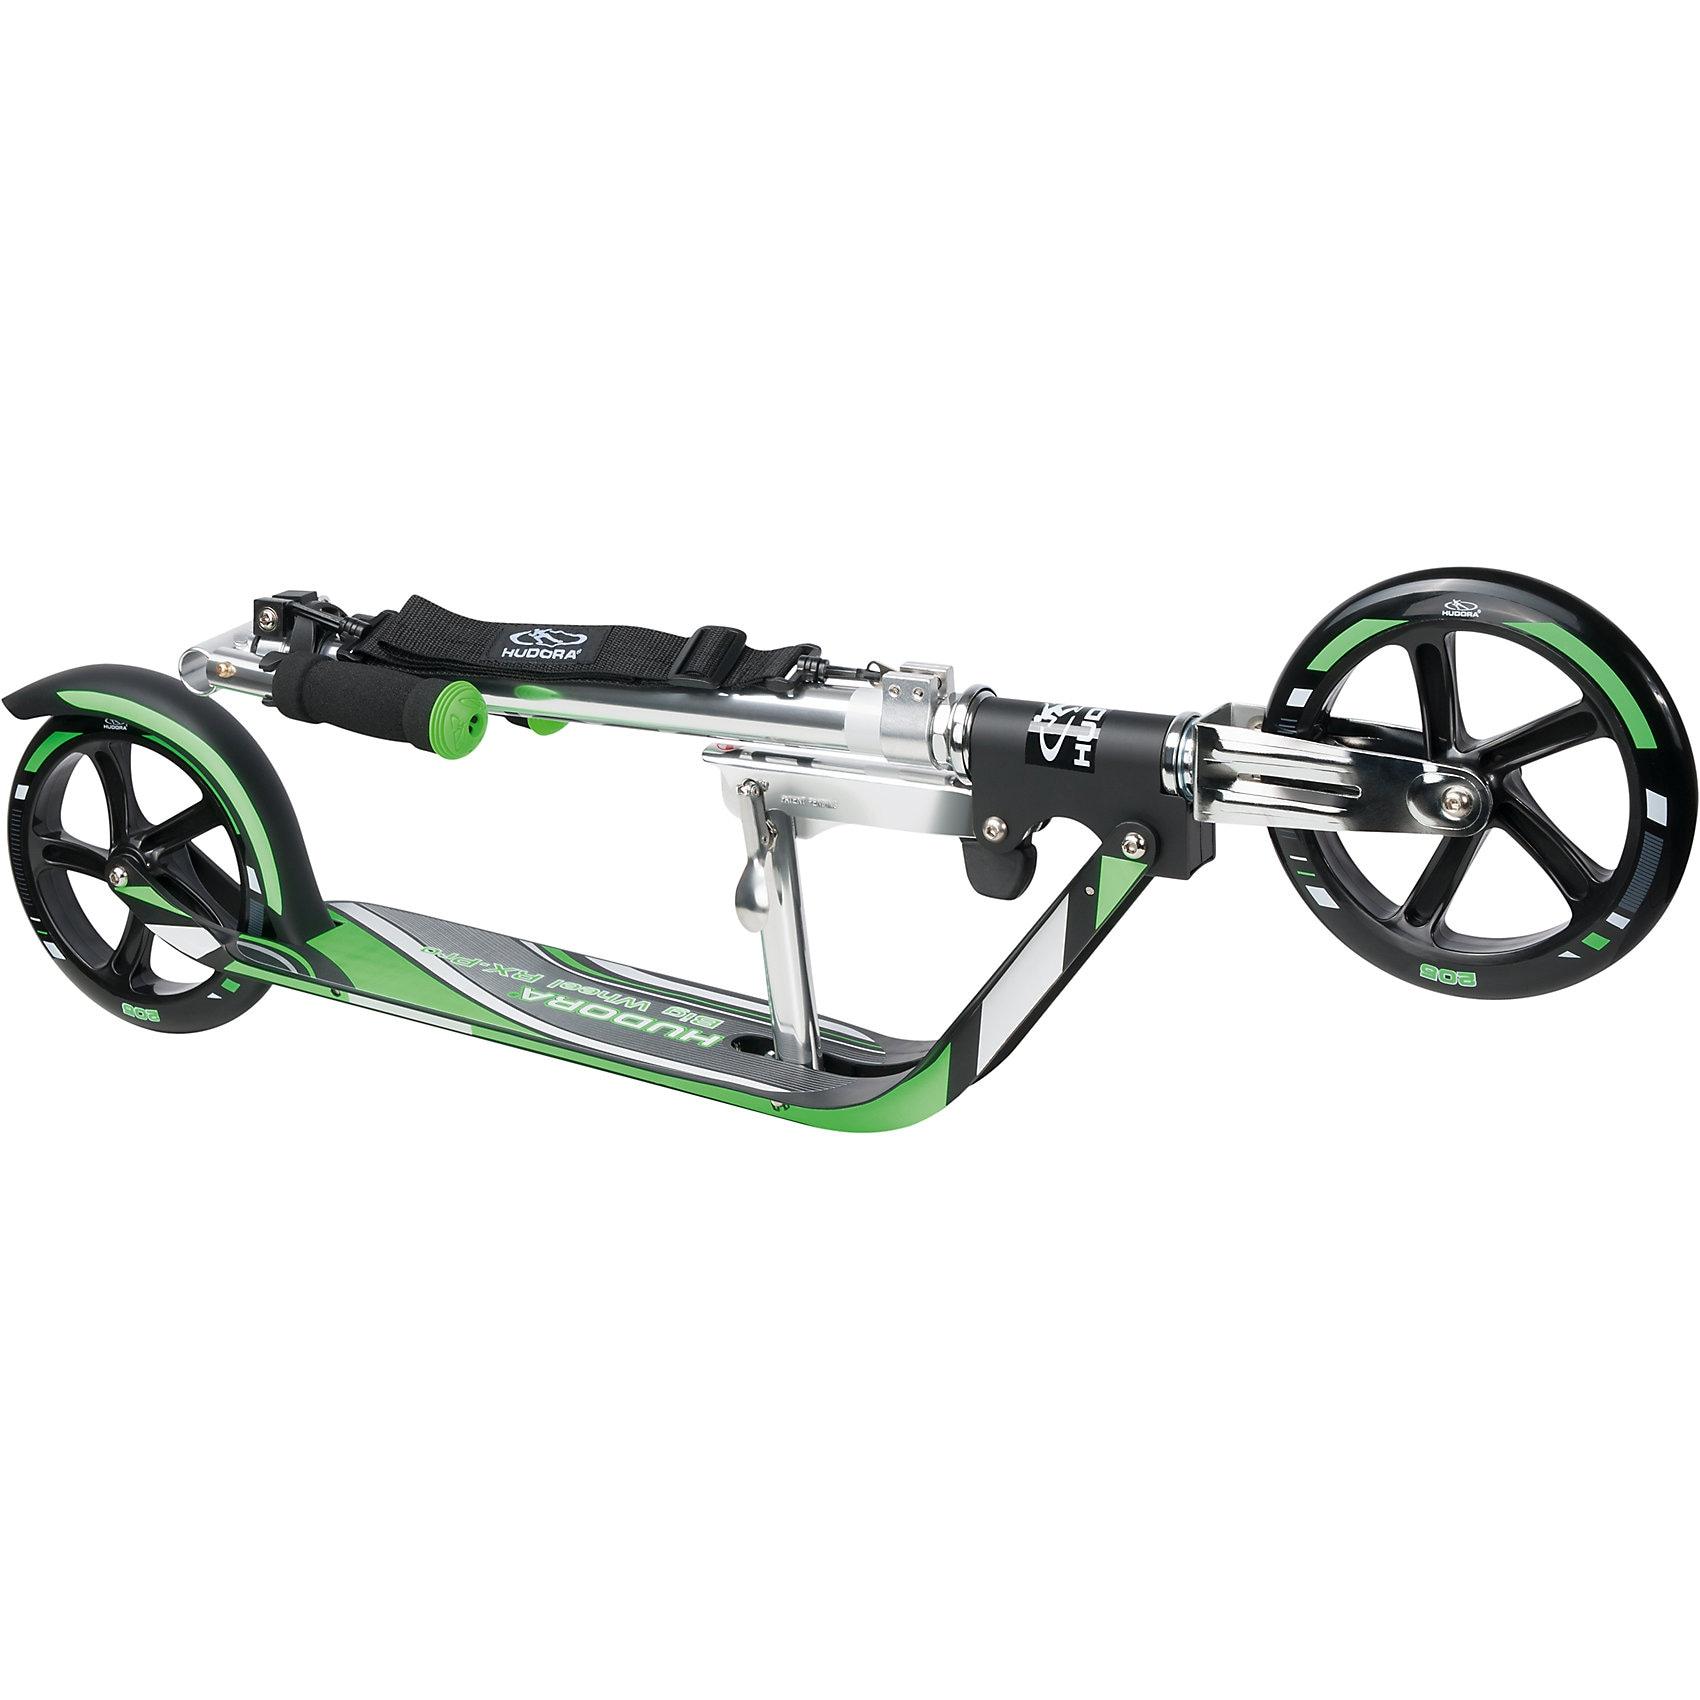 Hudora Scooter Big Wheel RX Pro 205 grün